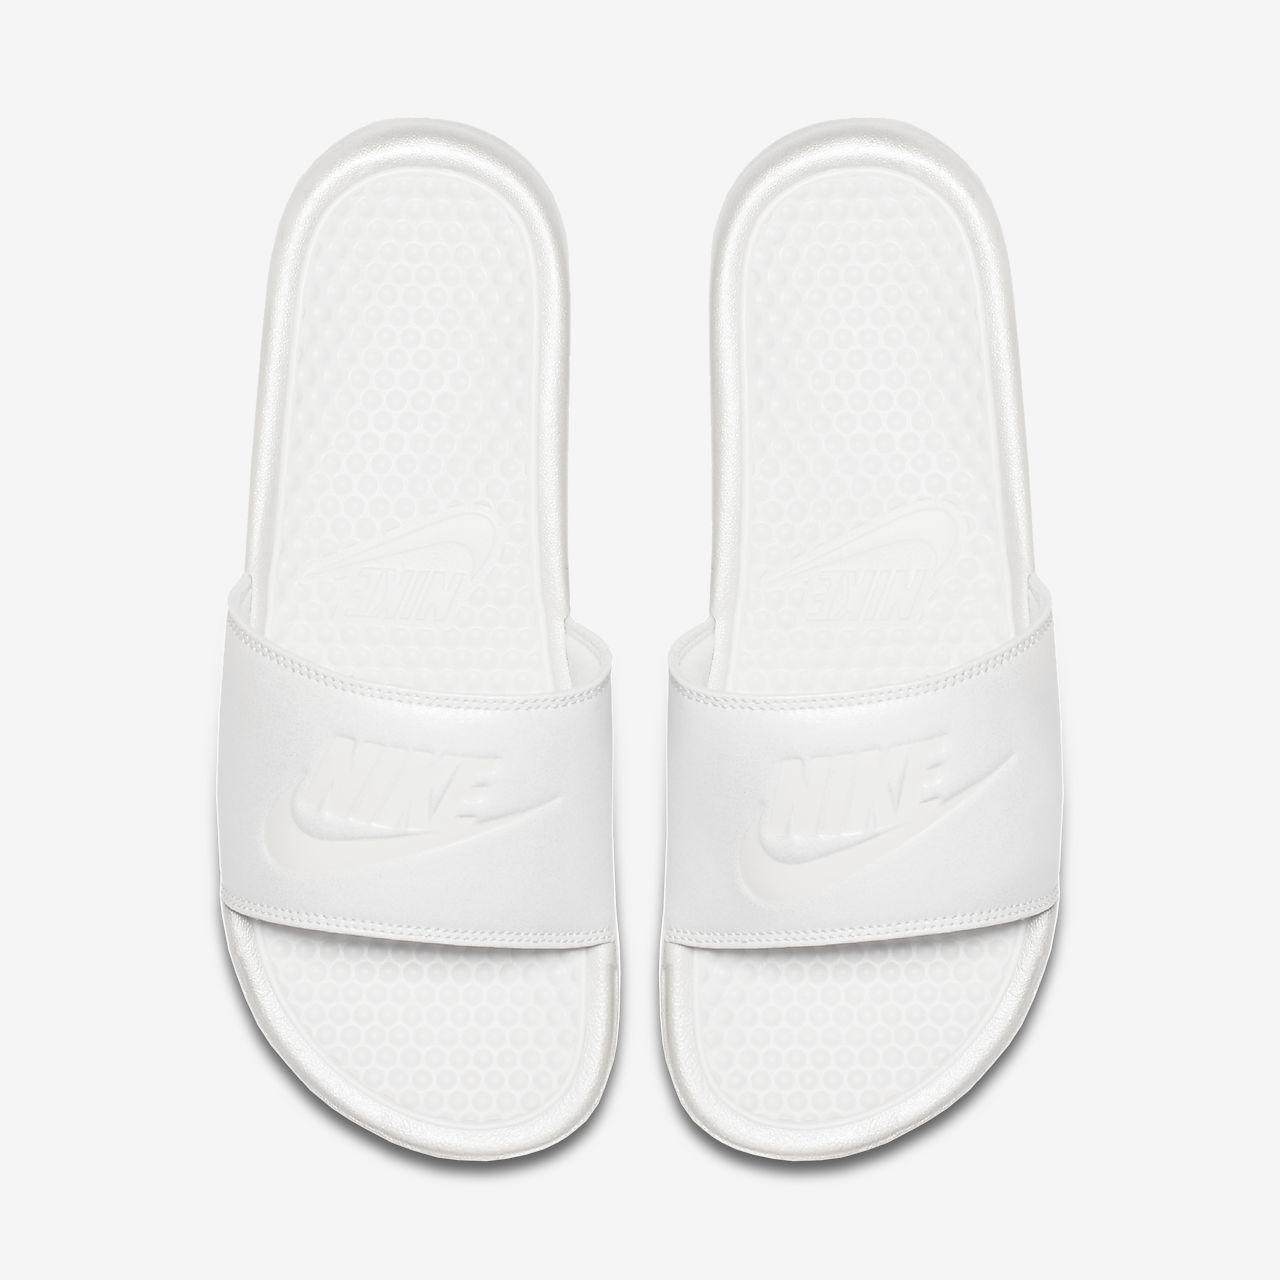 083066d7fd43 ... Nike Benassi Metallic Metallic Metallic QS Damen-Badeslipper c51026 ...